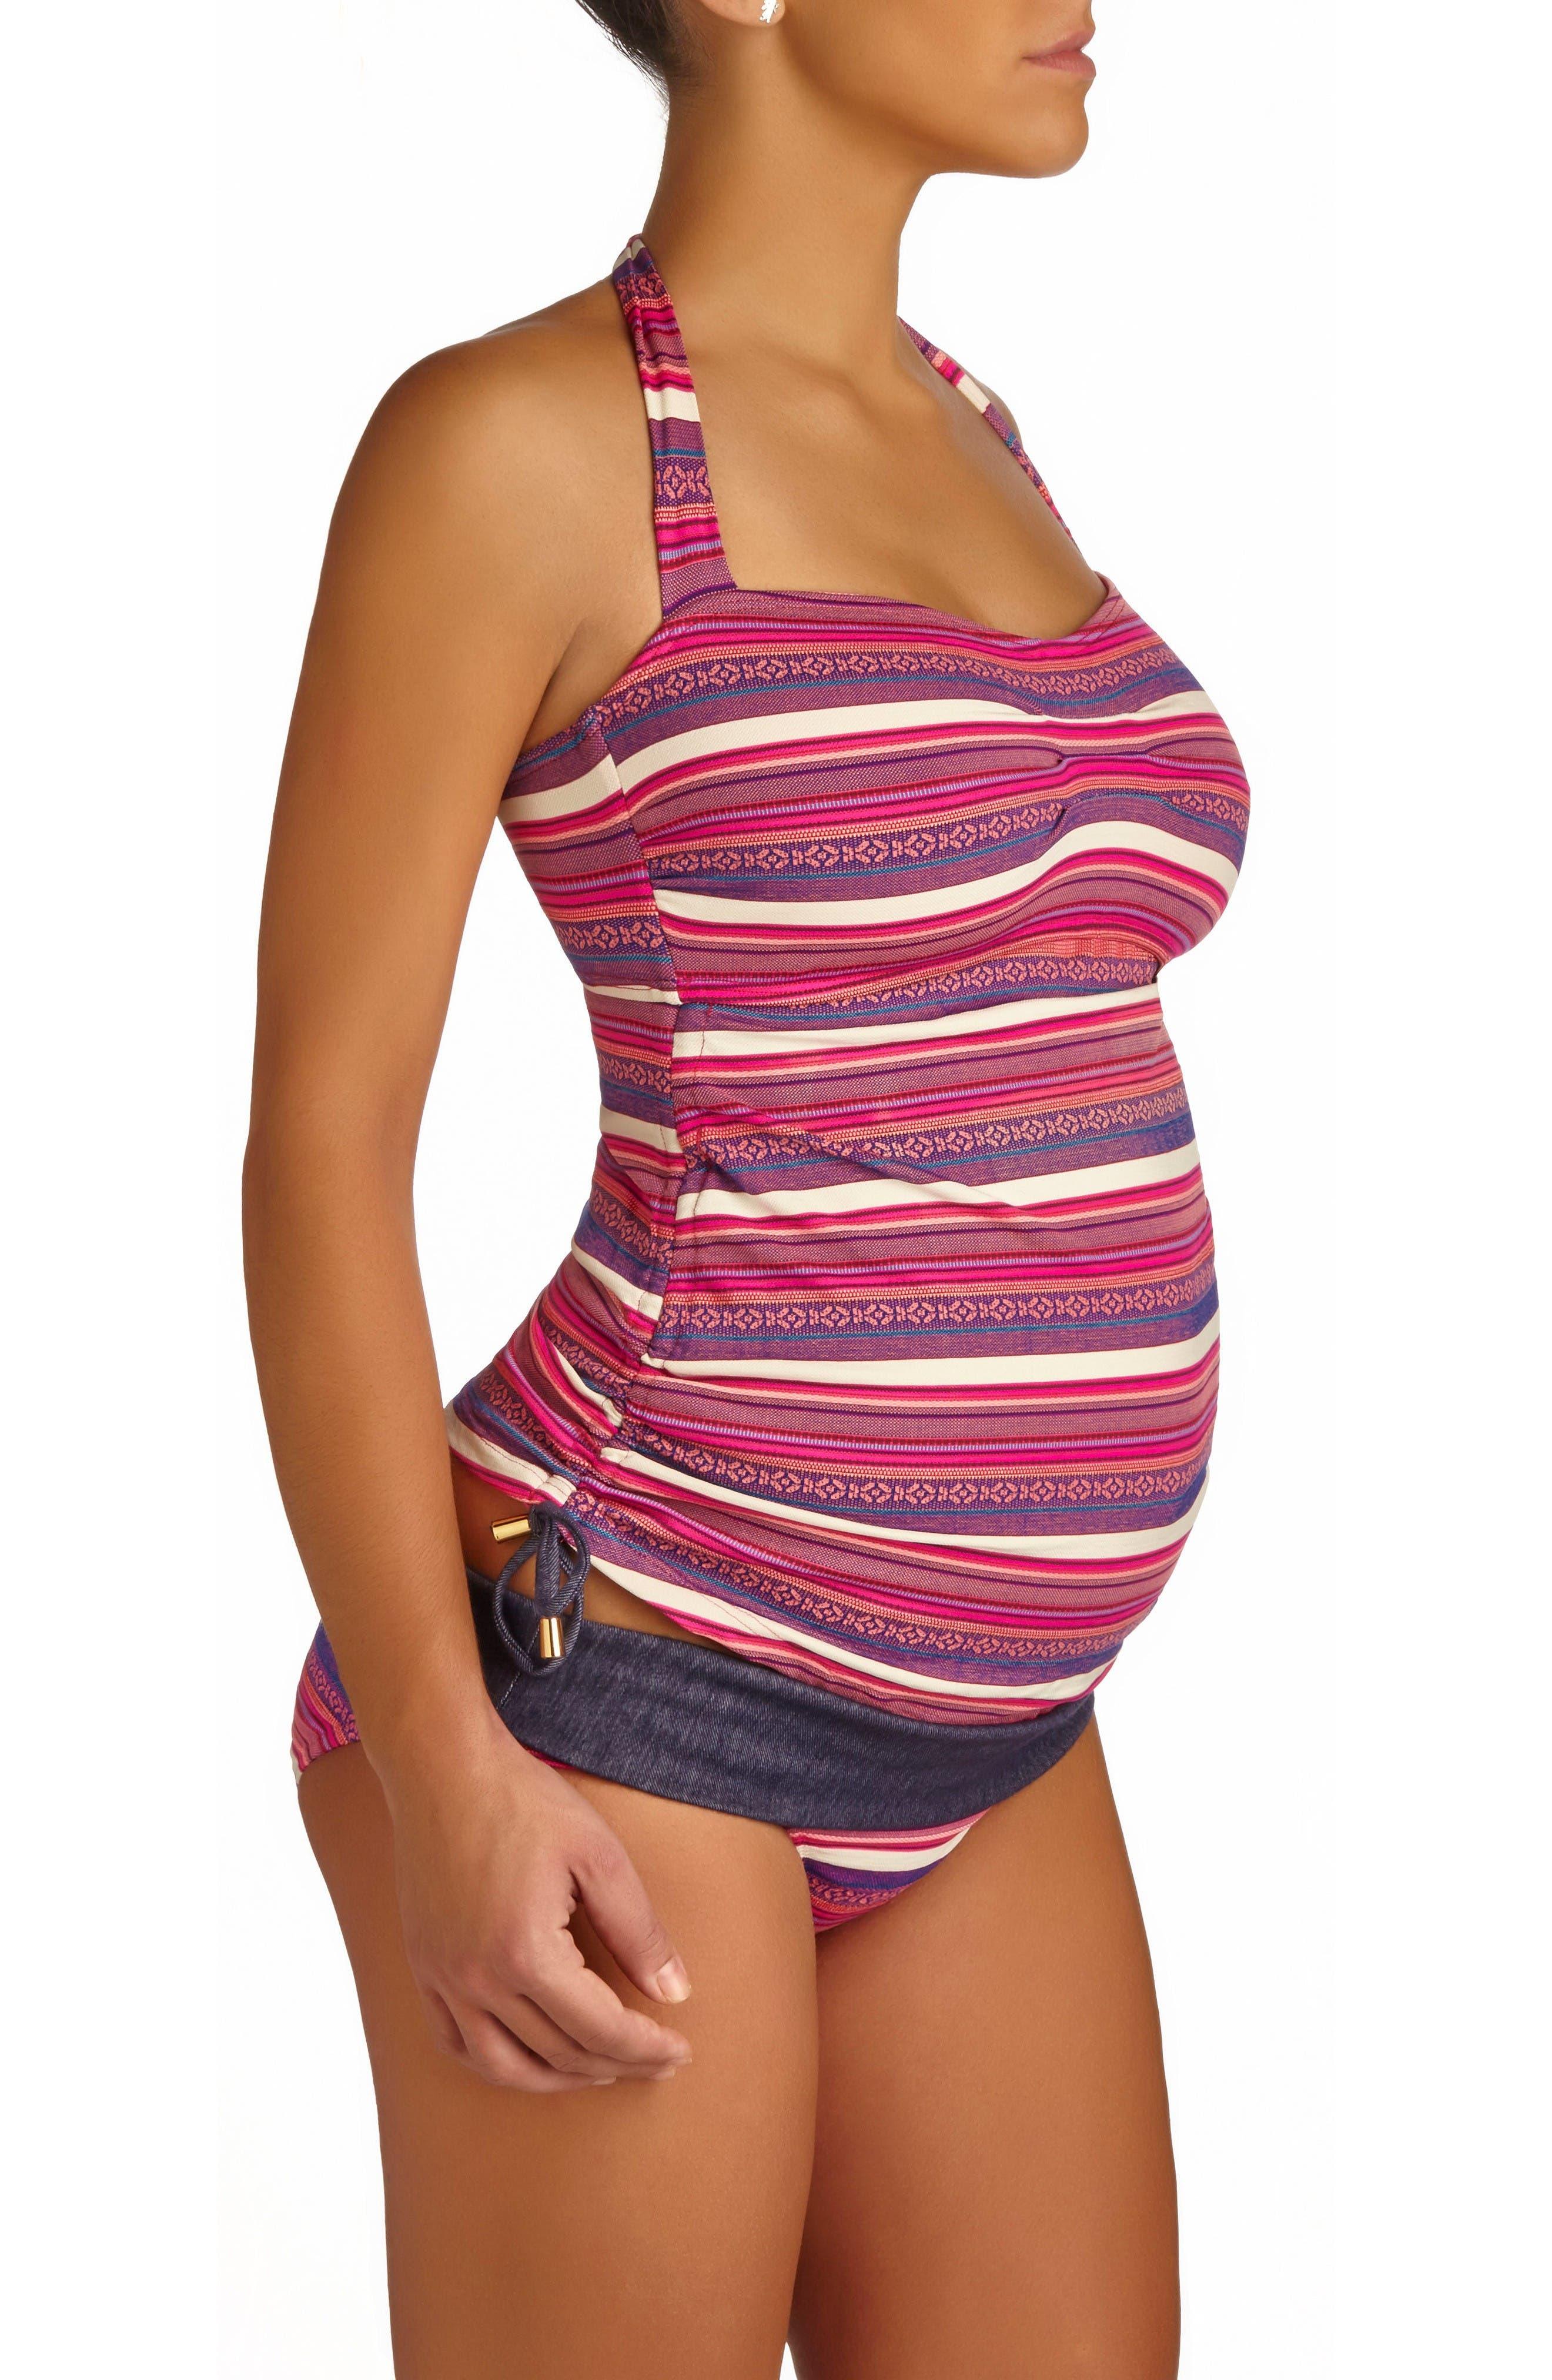 Main Image - Pez D'Or Oaxaca Jacquard Tankini Maternity Swimsuit